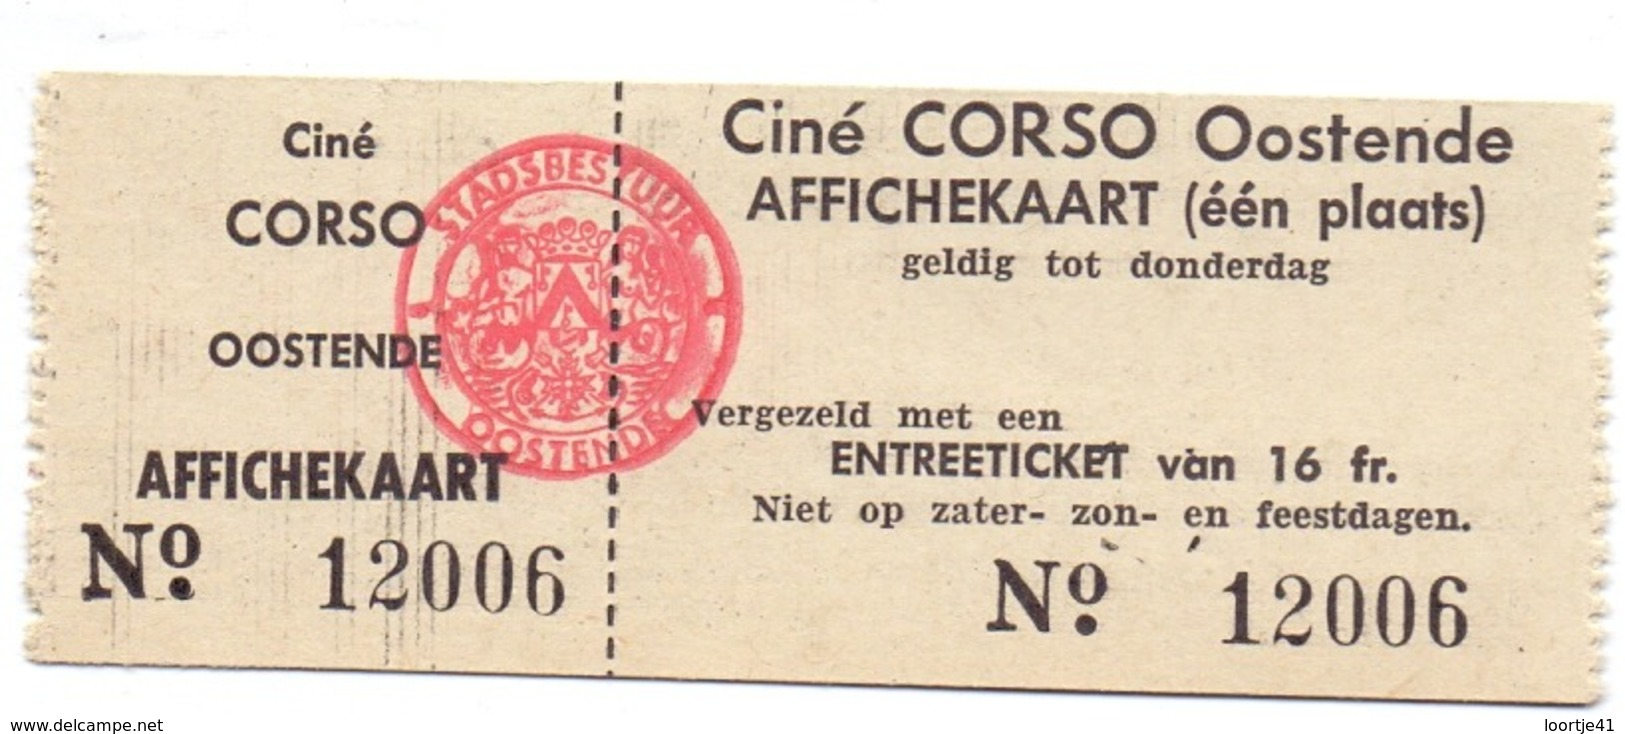 Ticket D' Entrée Ingangsticket - Cinema Bioscoop Ciné Corso - Oostende - Tickets - Vouchers